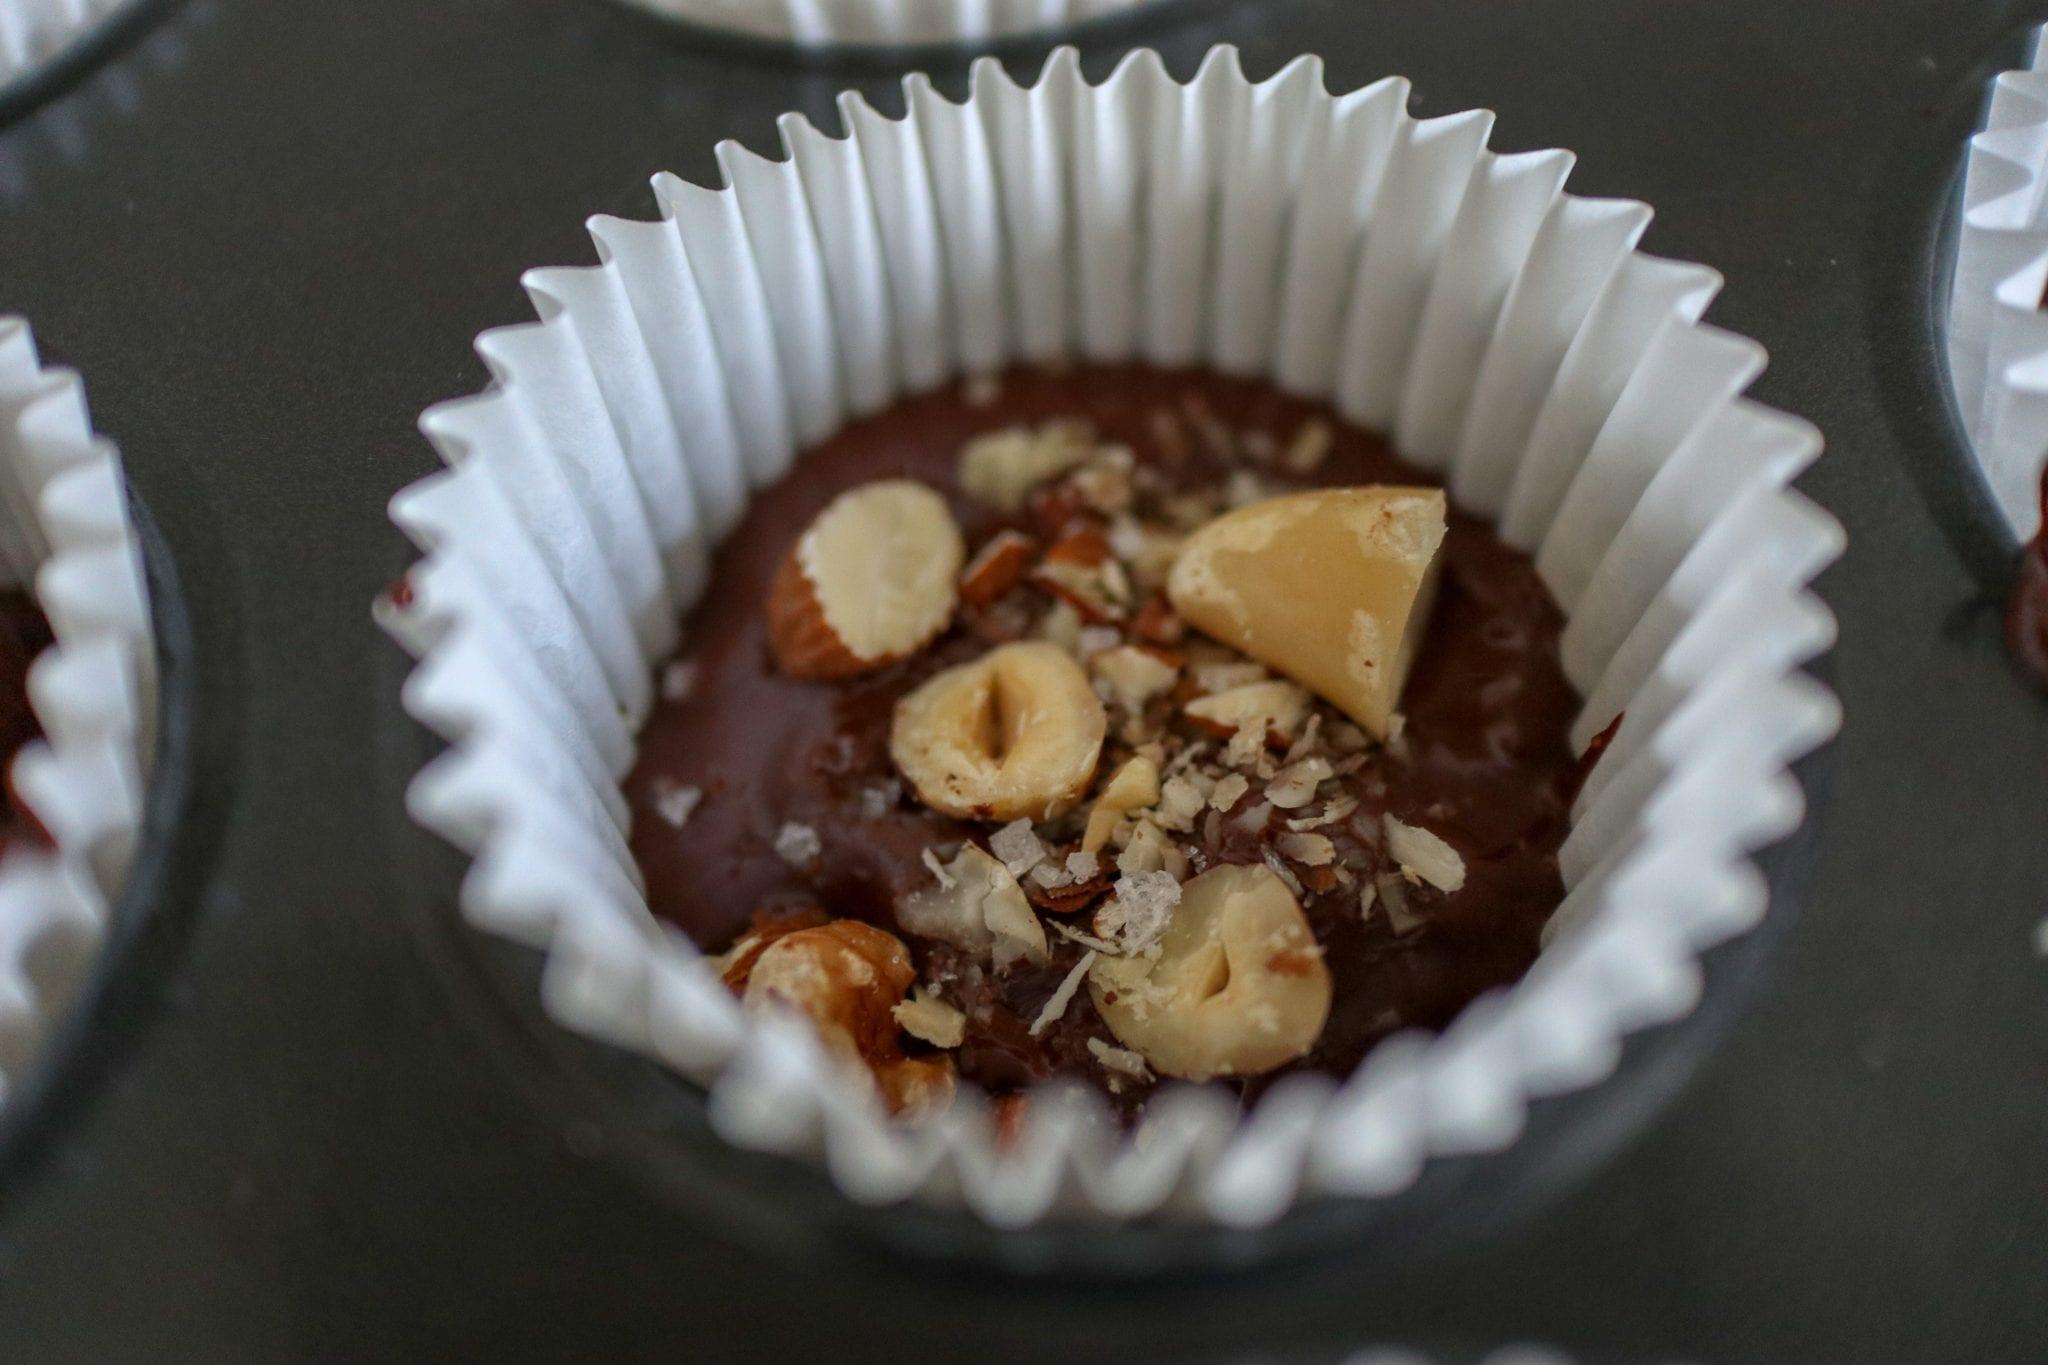 10 Minute Peanut Butter Nut Cups